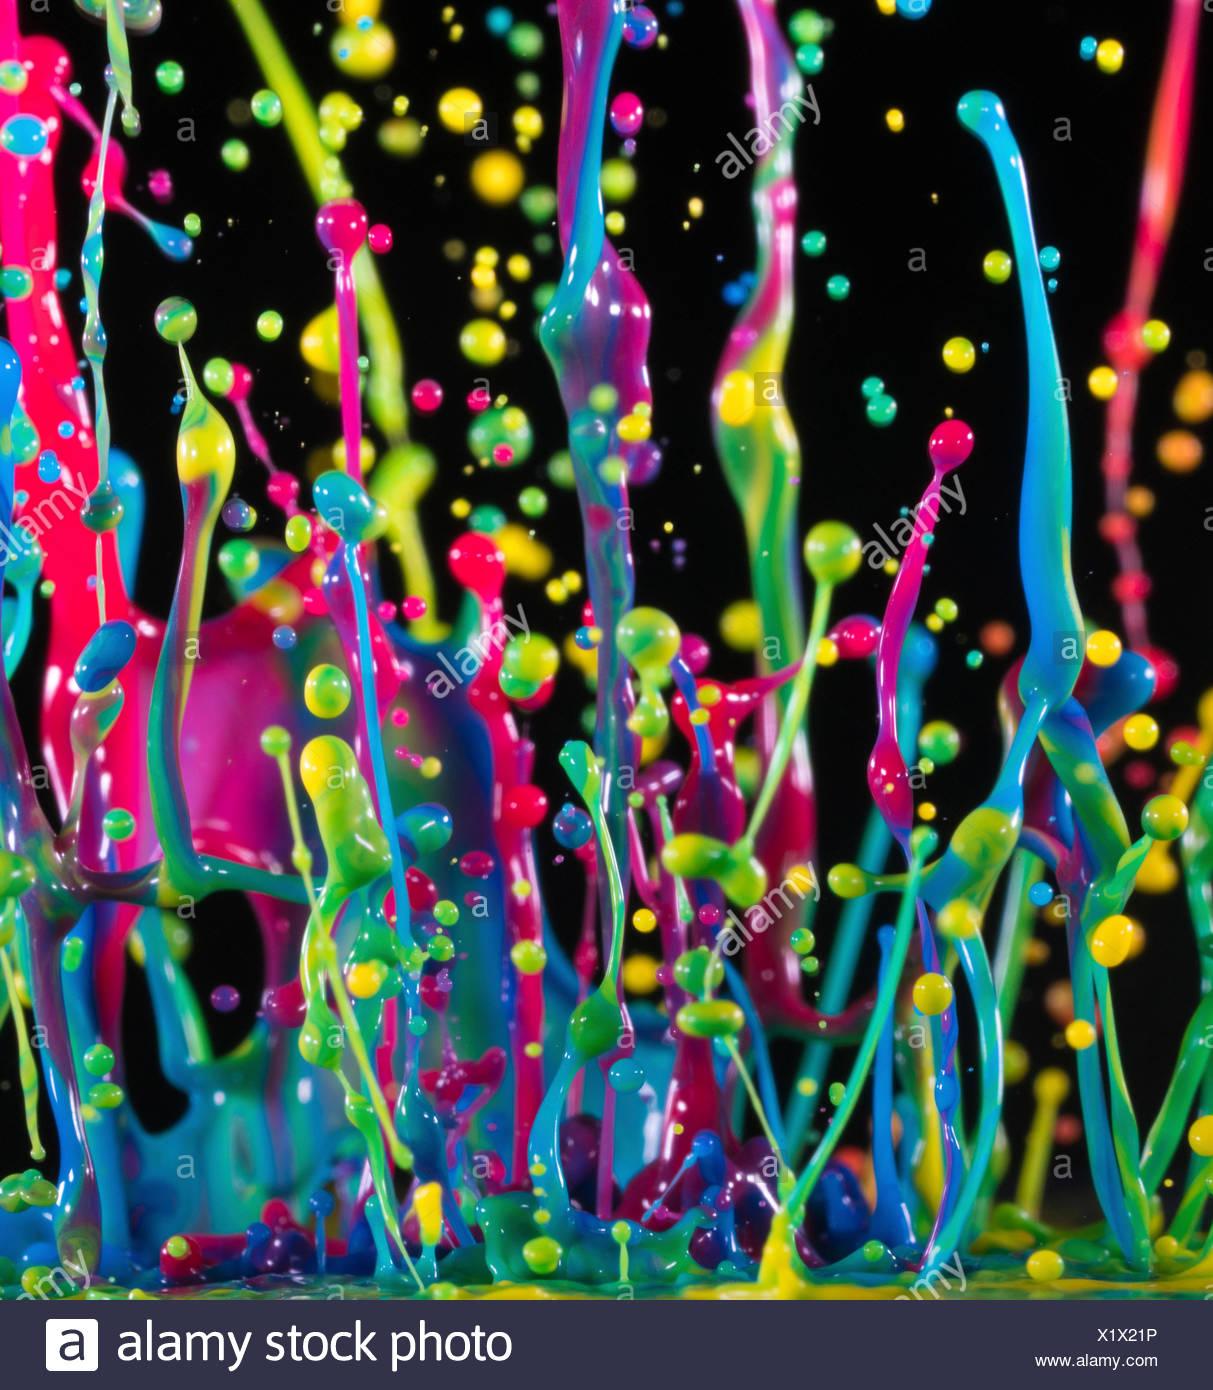 Pinceladas multicolores contra un fondo negro, Imagen De Stock